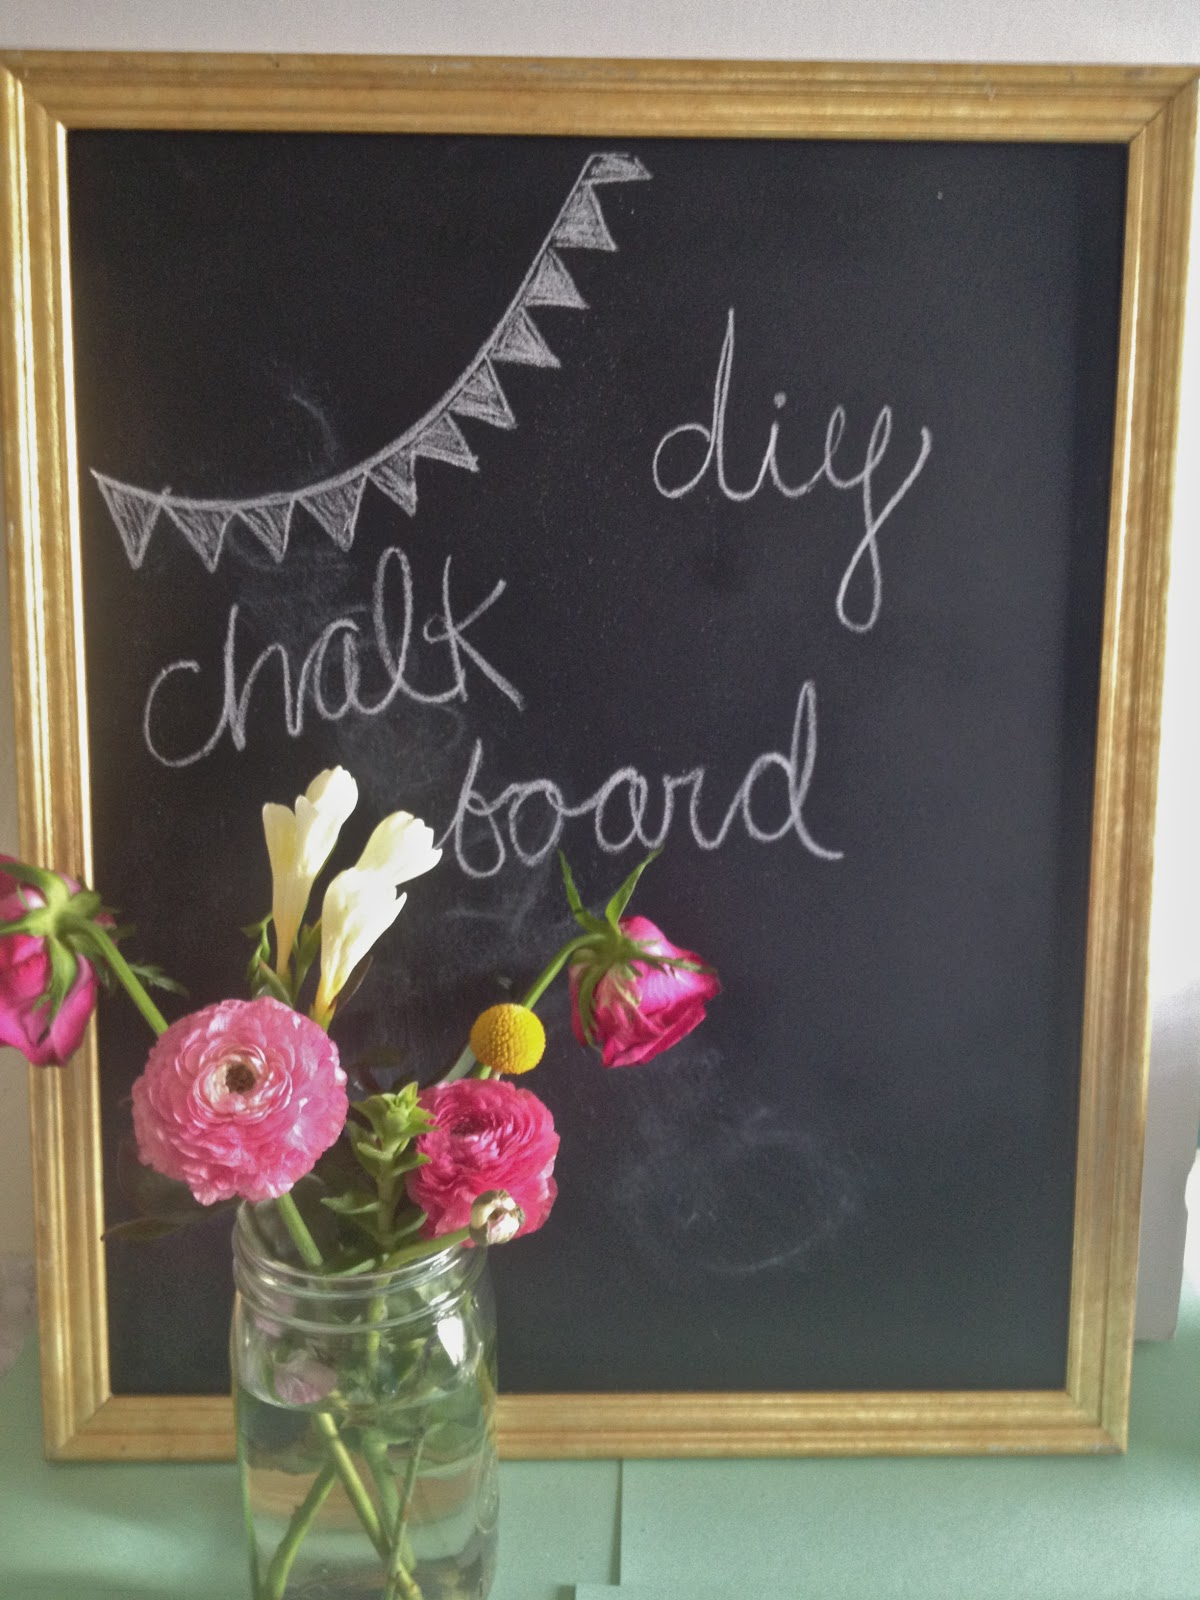 diy chalkboard from thrifted frame - Diy Chalkboard Frame